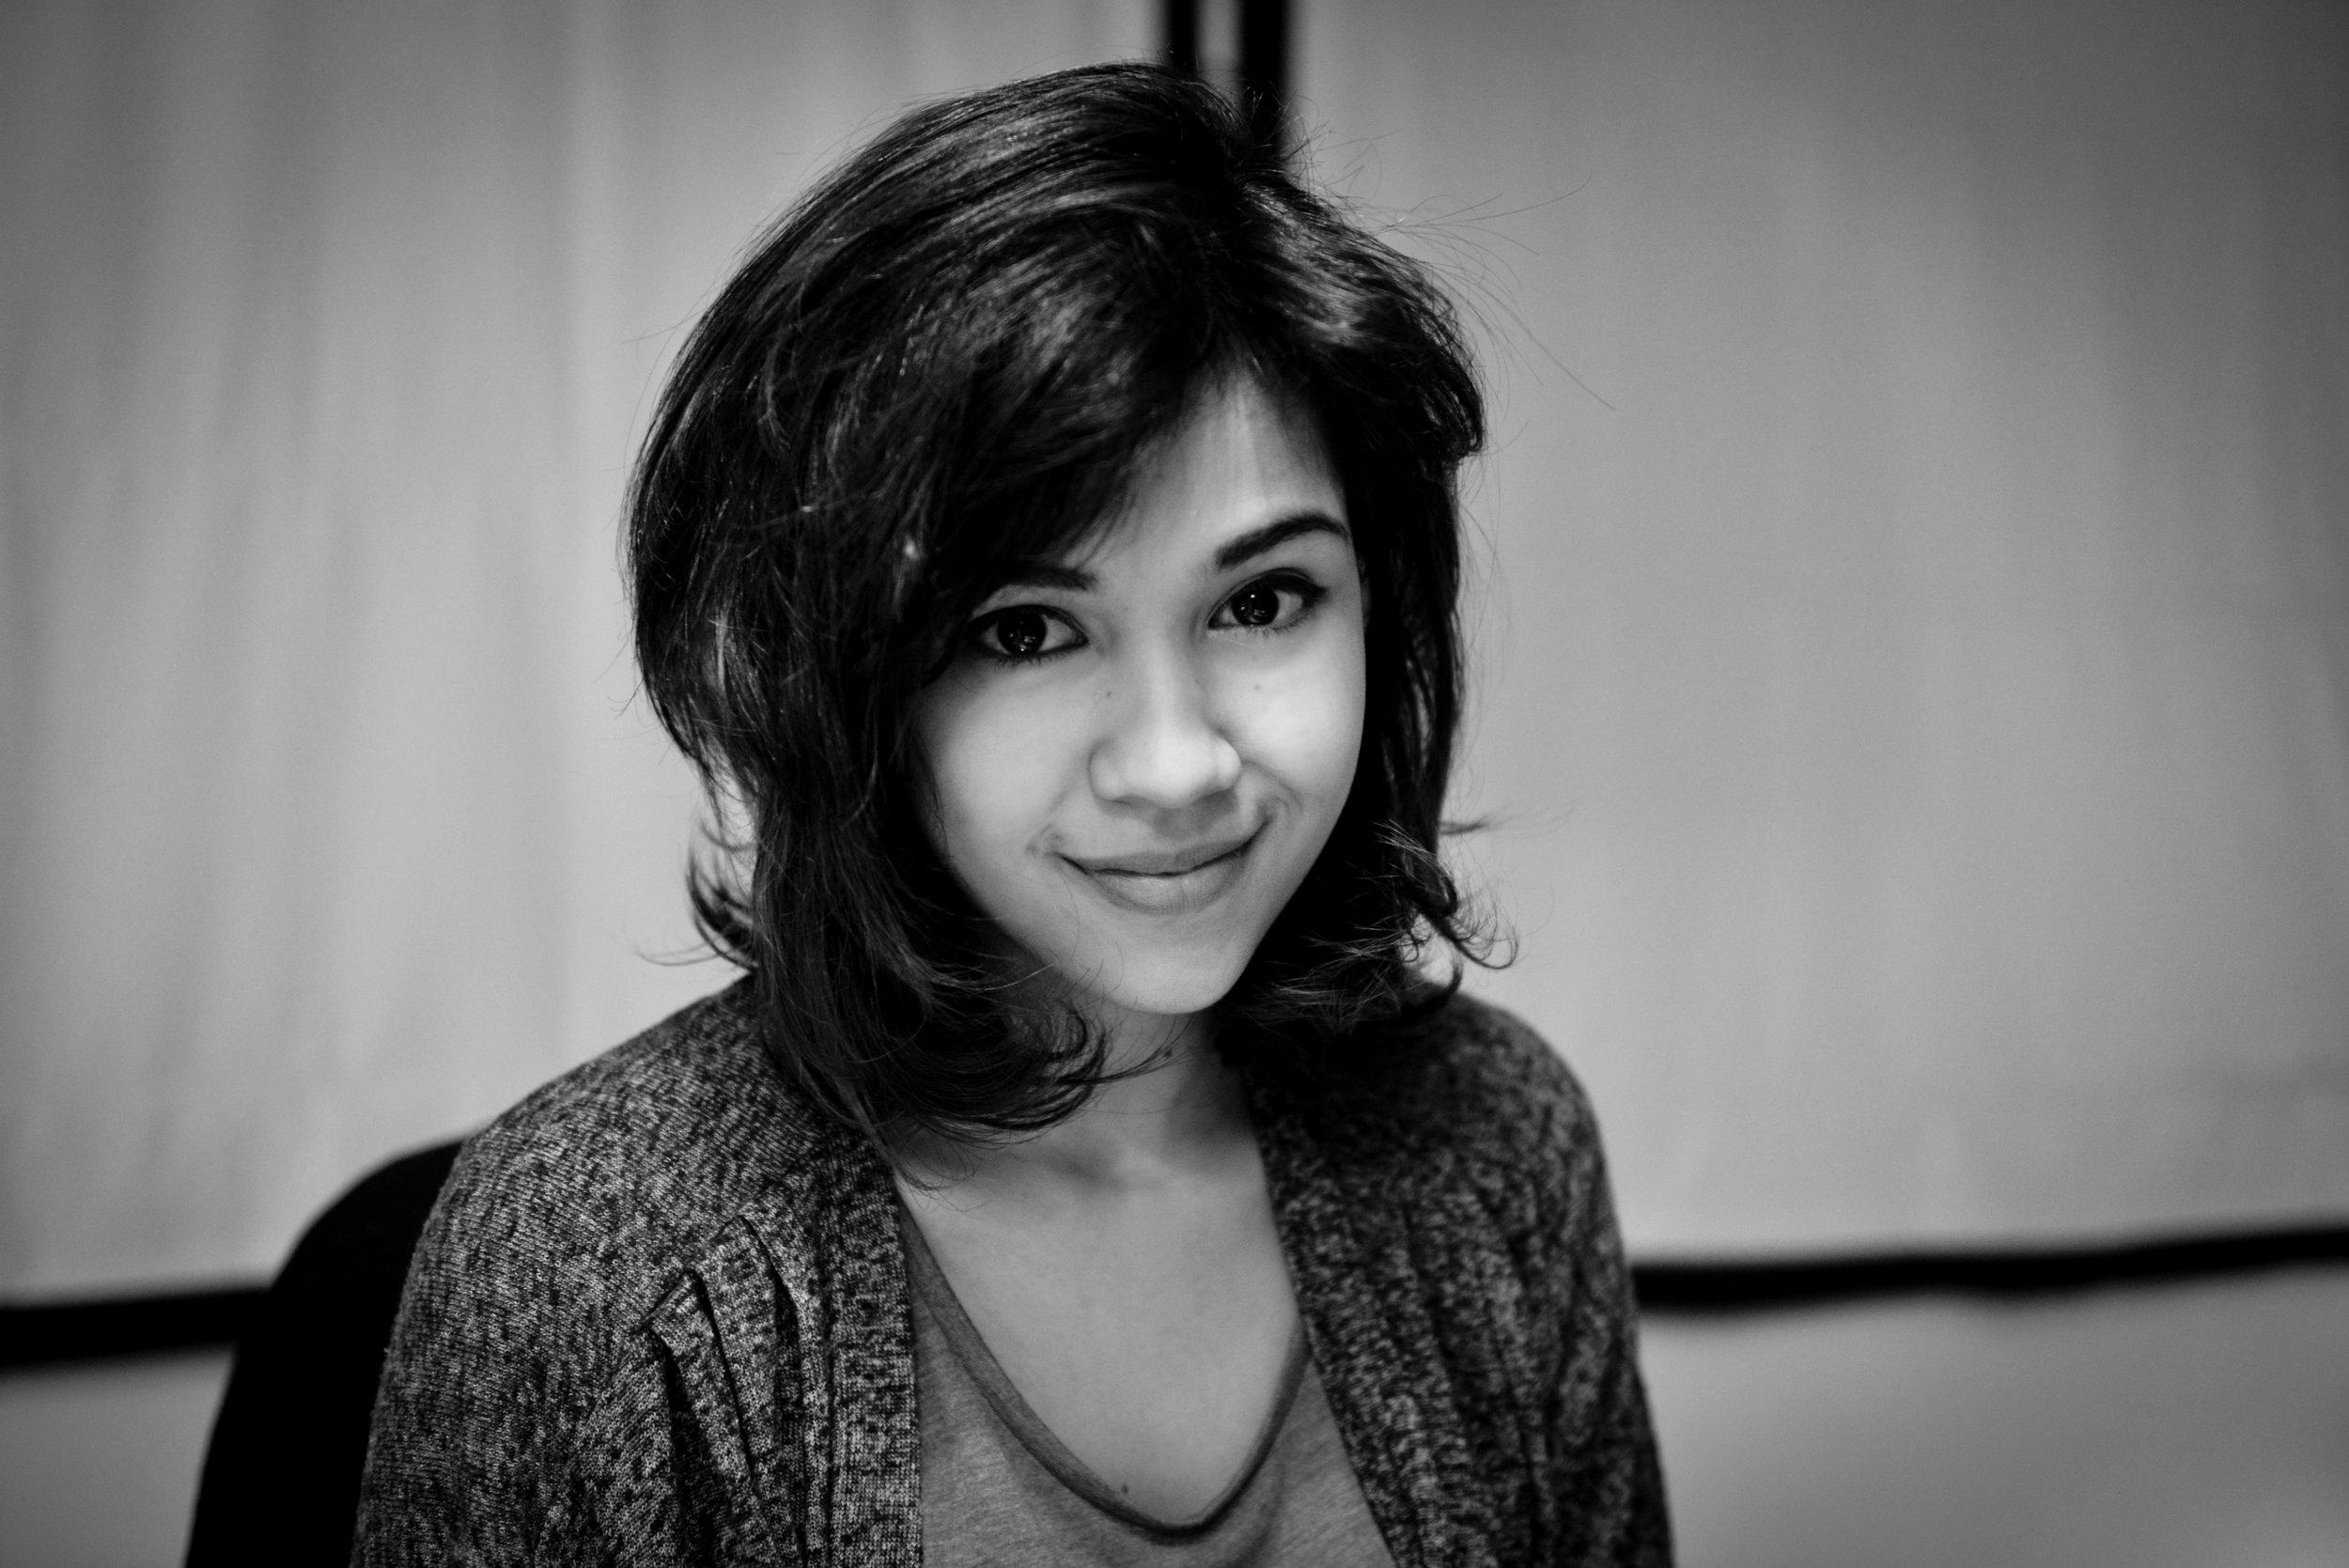 Kazi Istela Imam, Graphic Designer and Illustrator